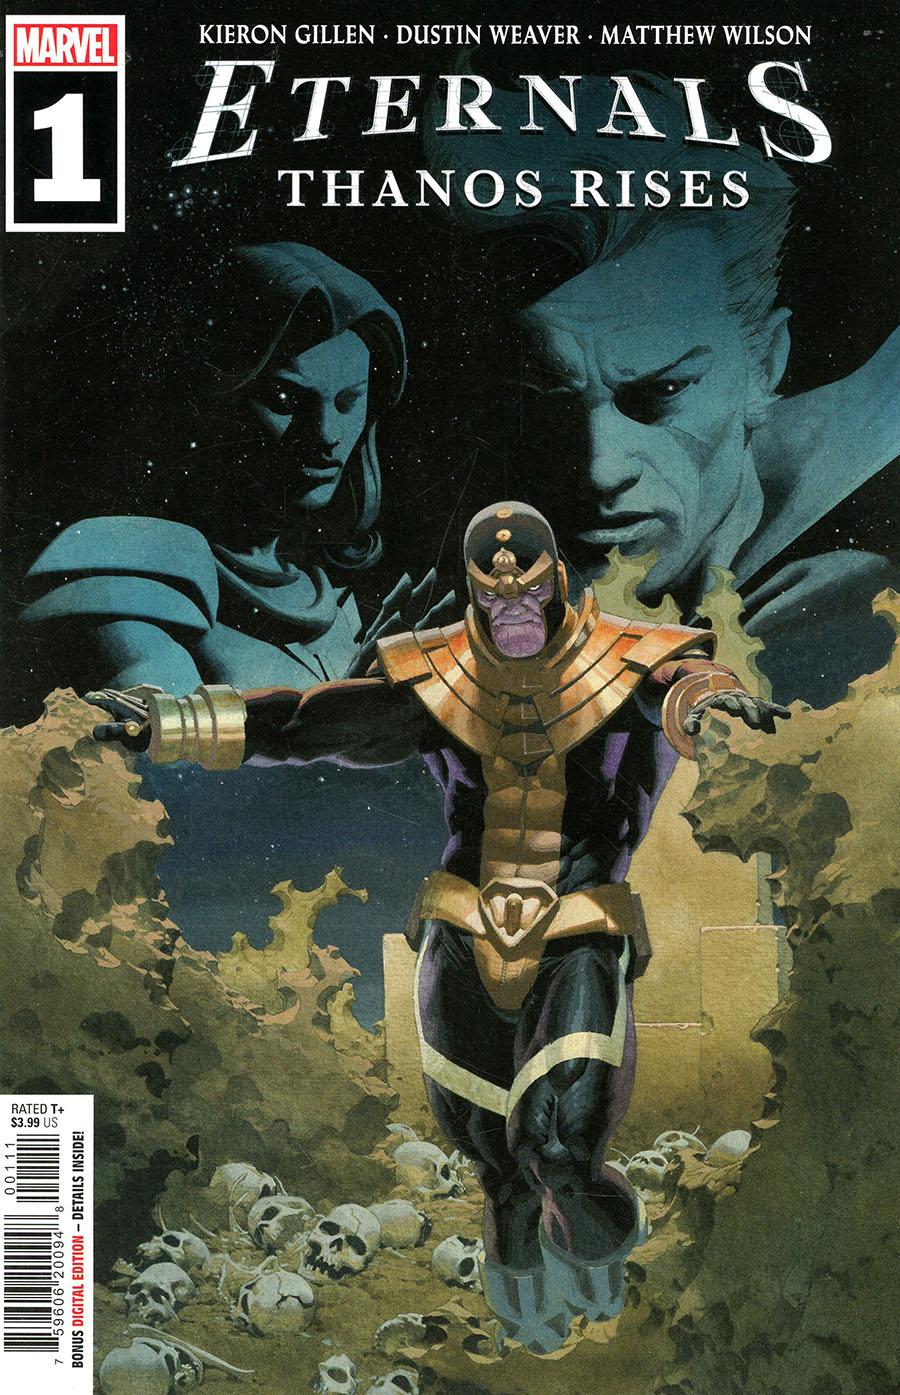 Eternals Thanos Rises #1 (One Shot) Cover A Regular Esad Ribic Cover